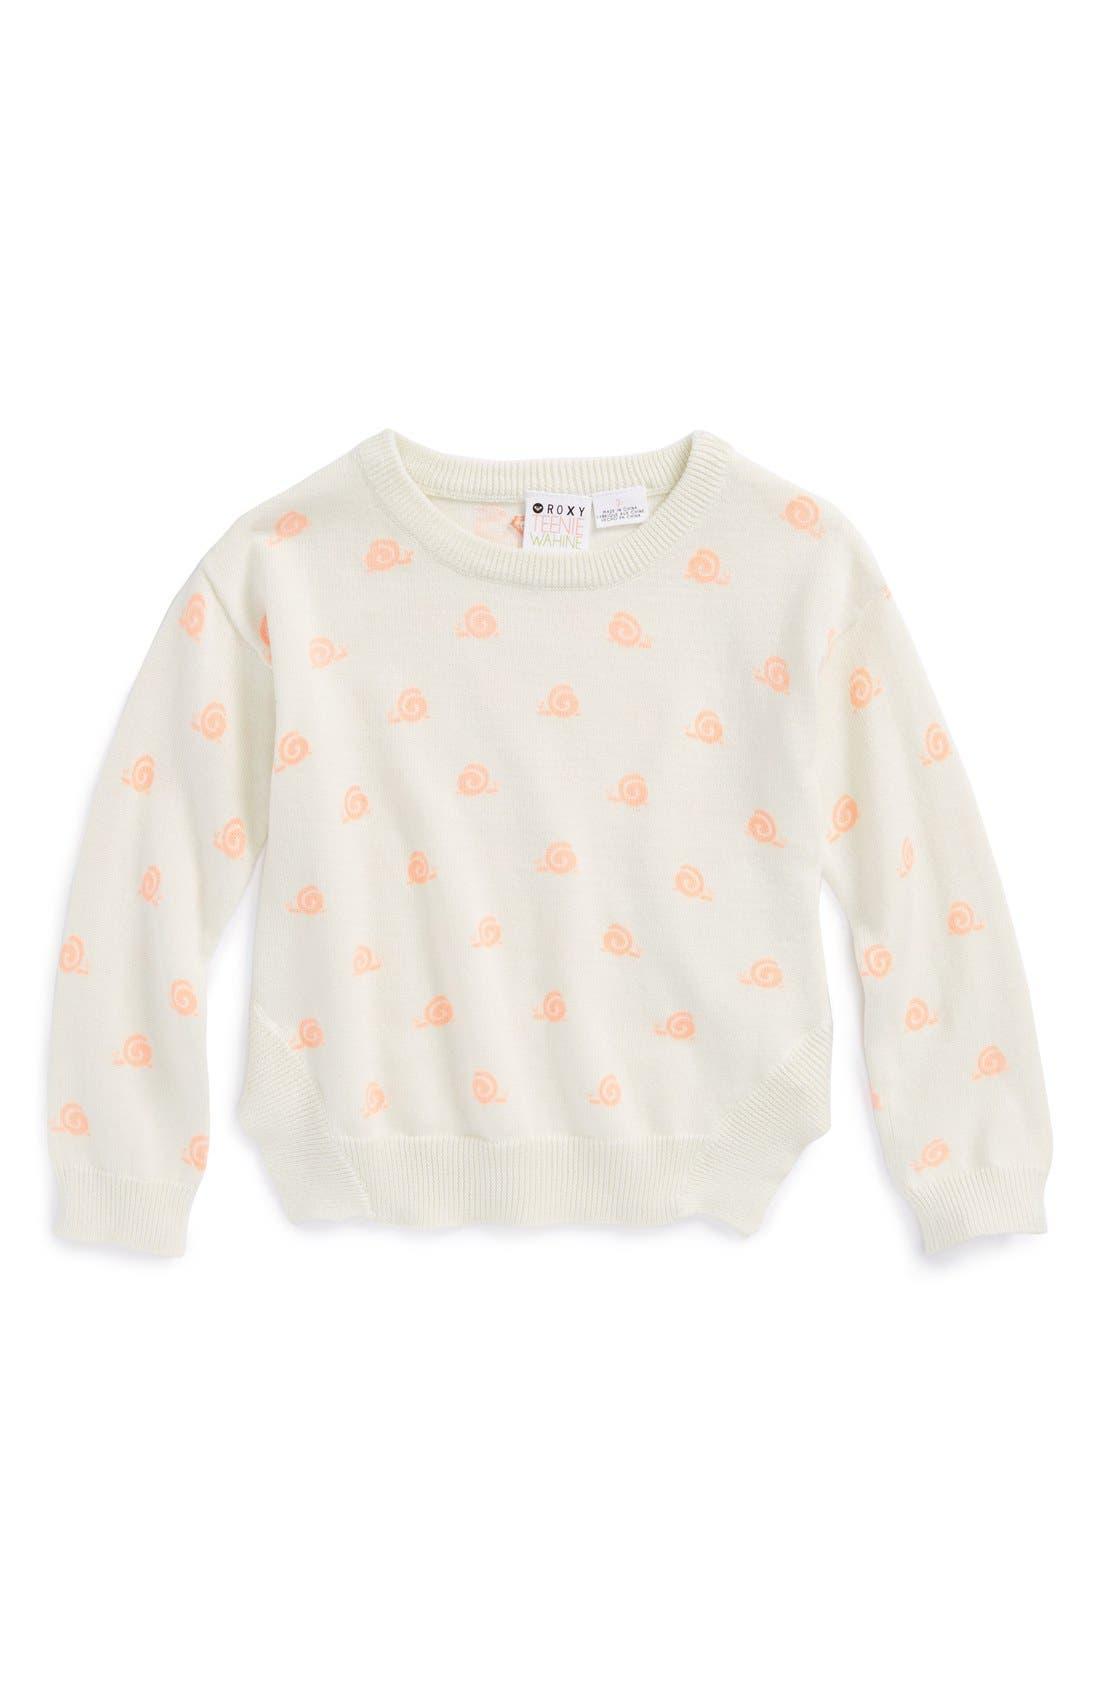 Main Image - Roxy 'Sea Pine' Sweater (Toddler Girls)